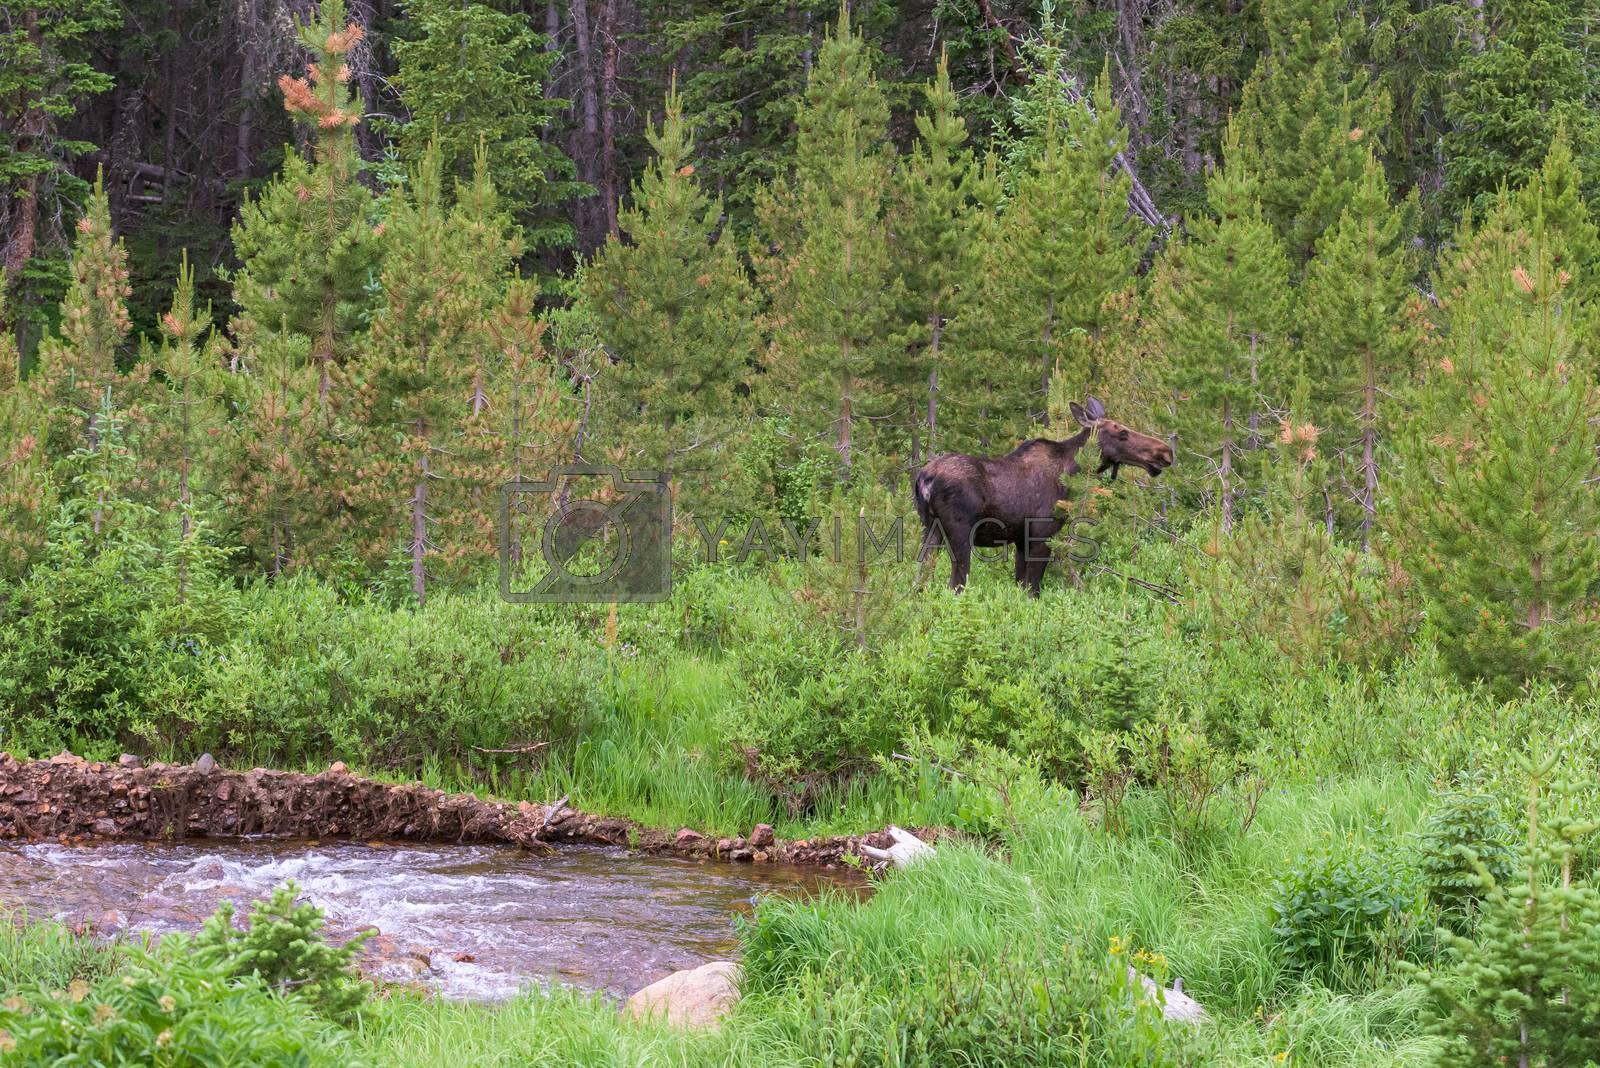 Moose in the Colorado Rocky Mountains. Cow moose feeding near a  by Gary Gray